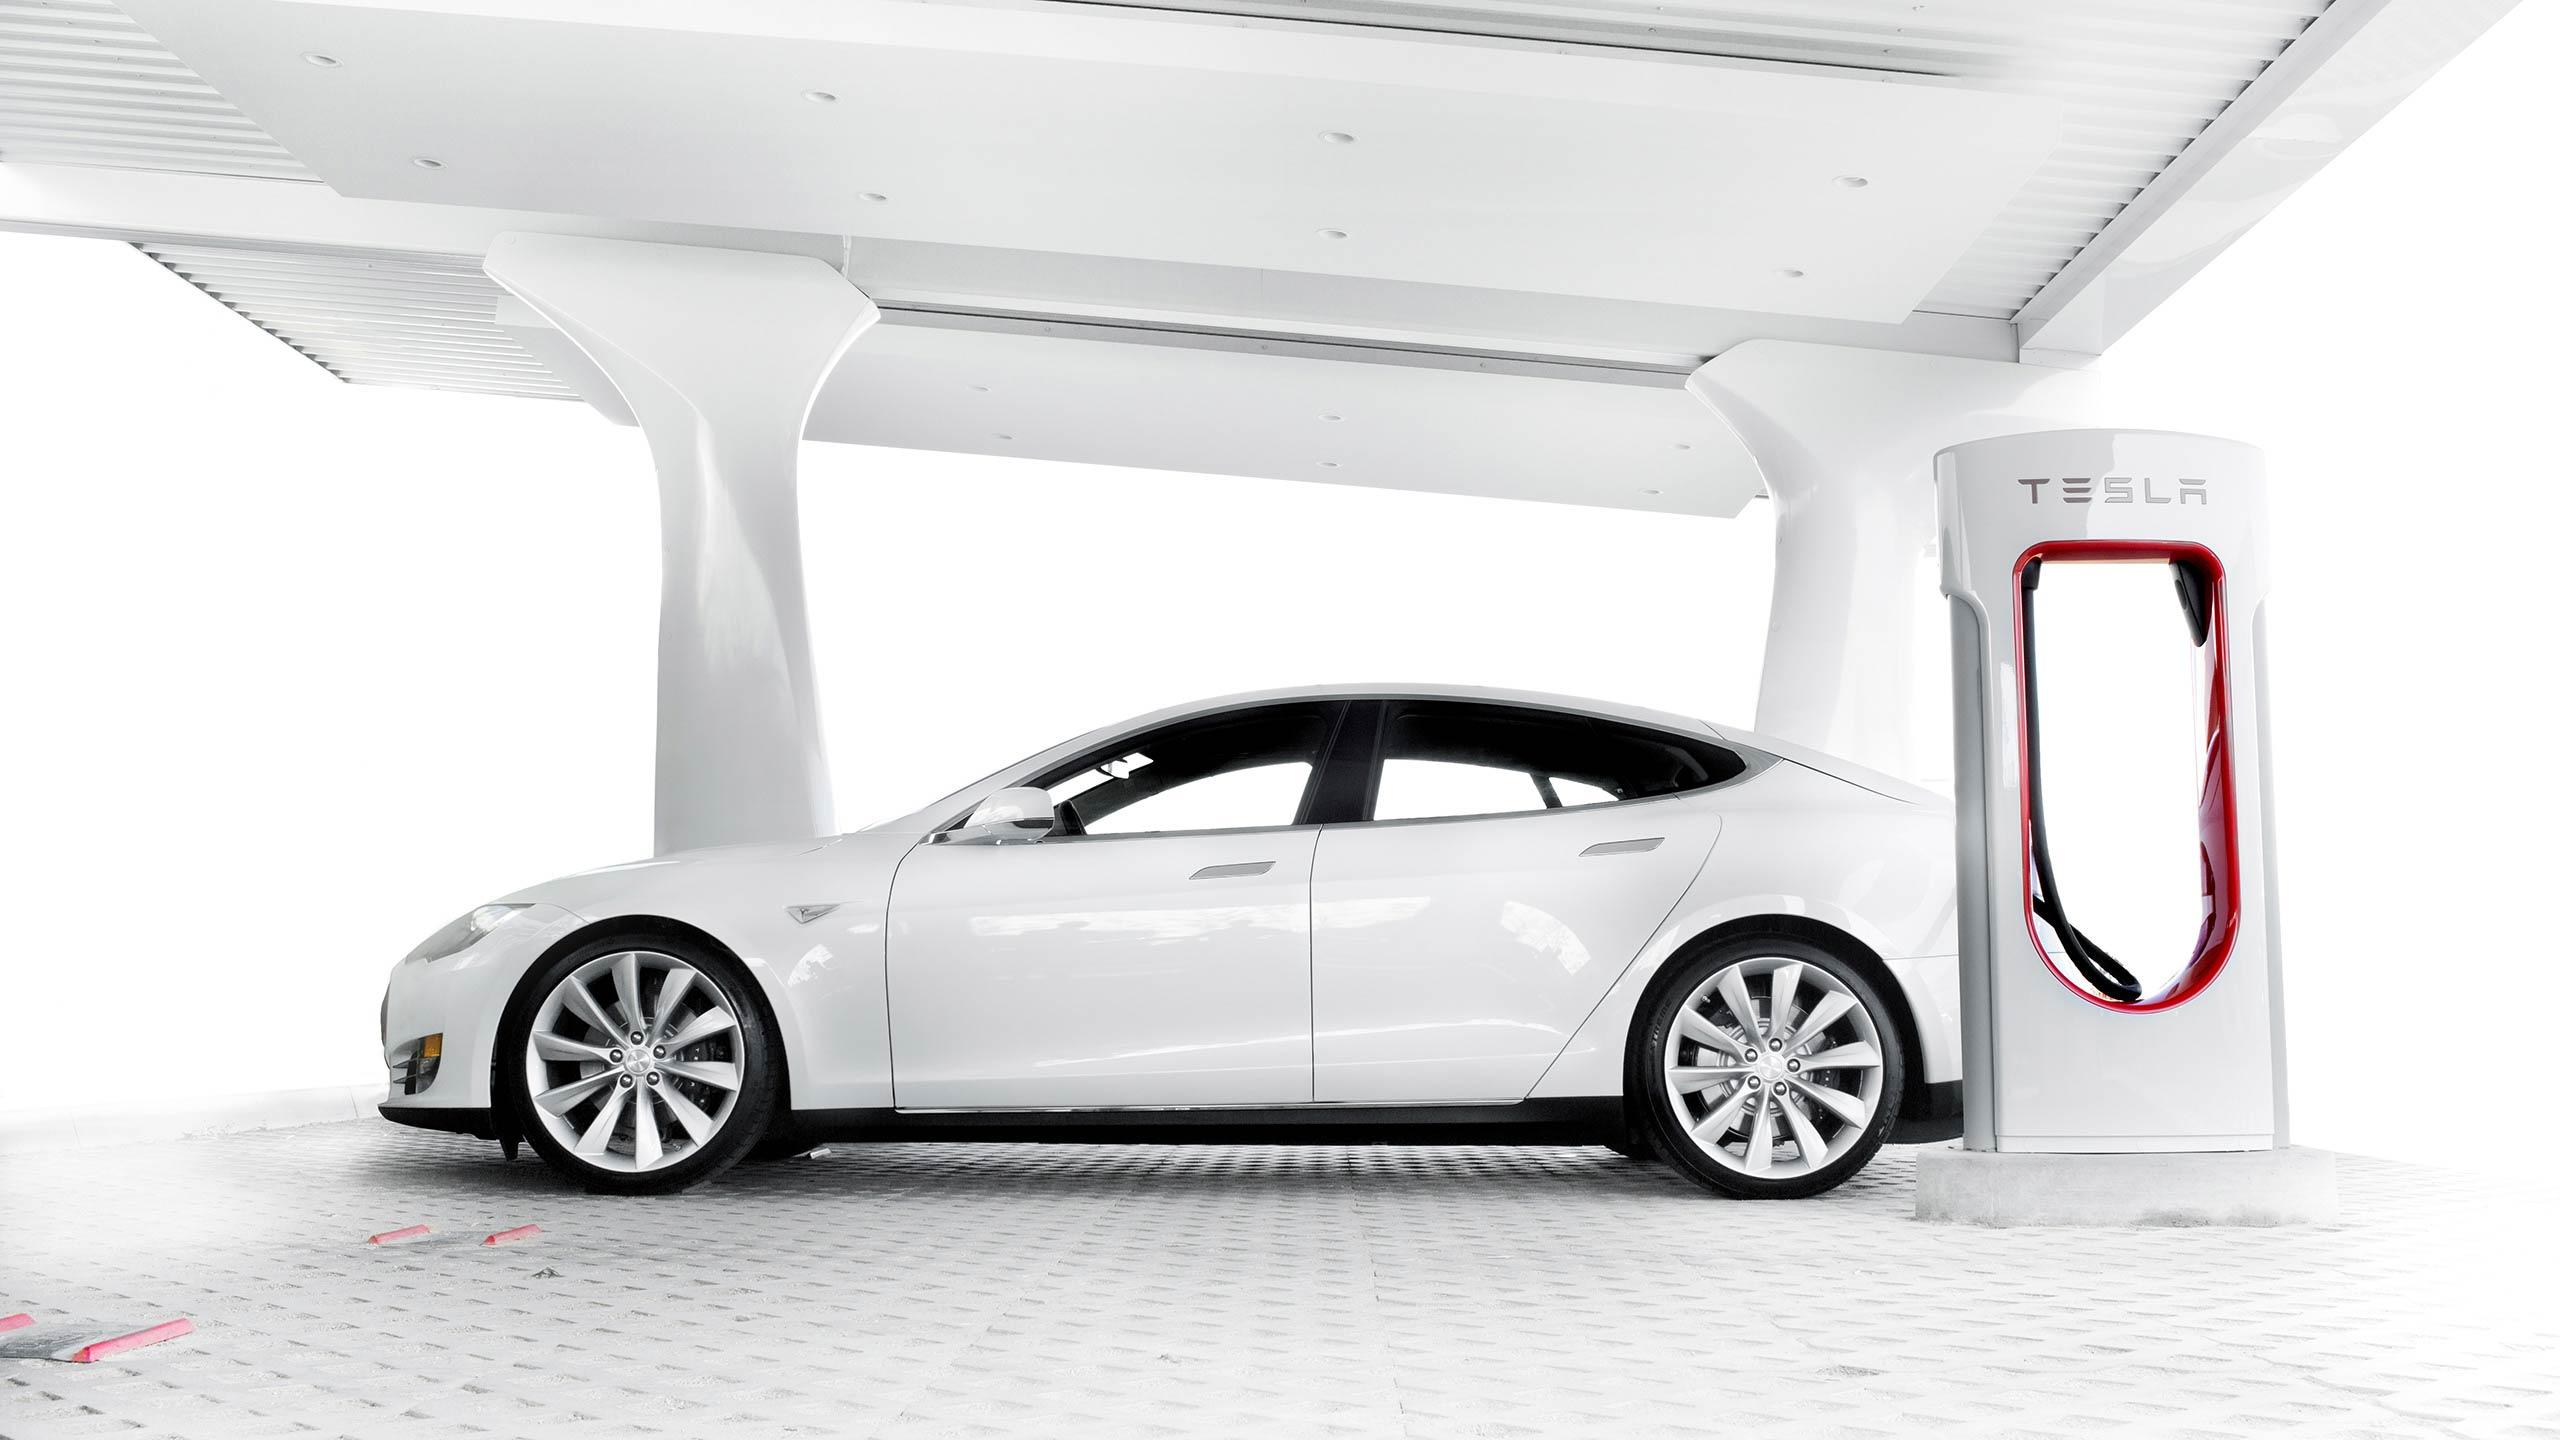 Charging your Tesla - Thomas Bensmann